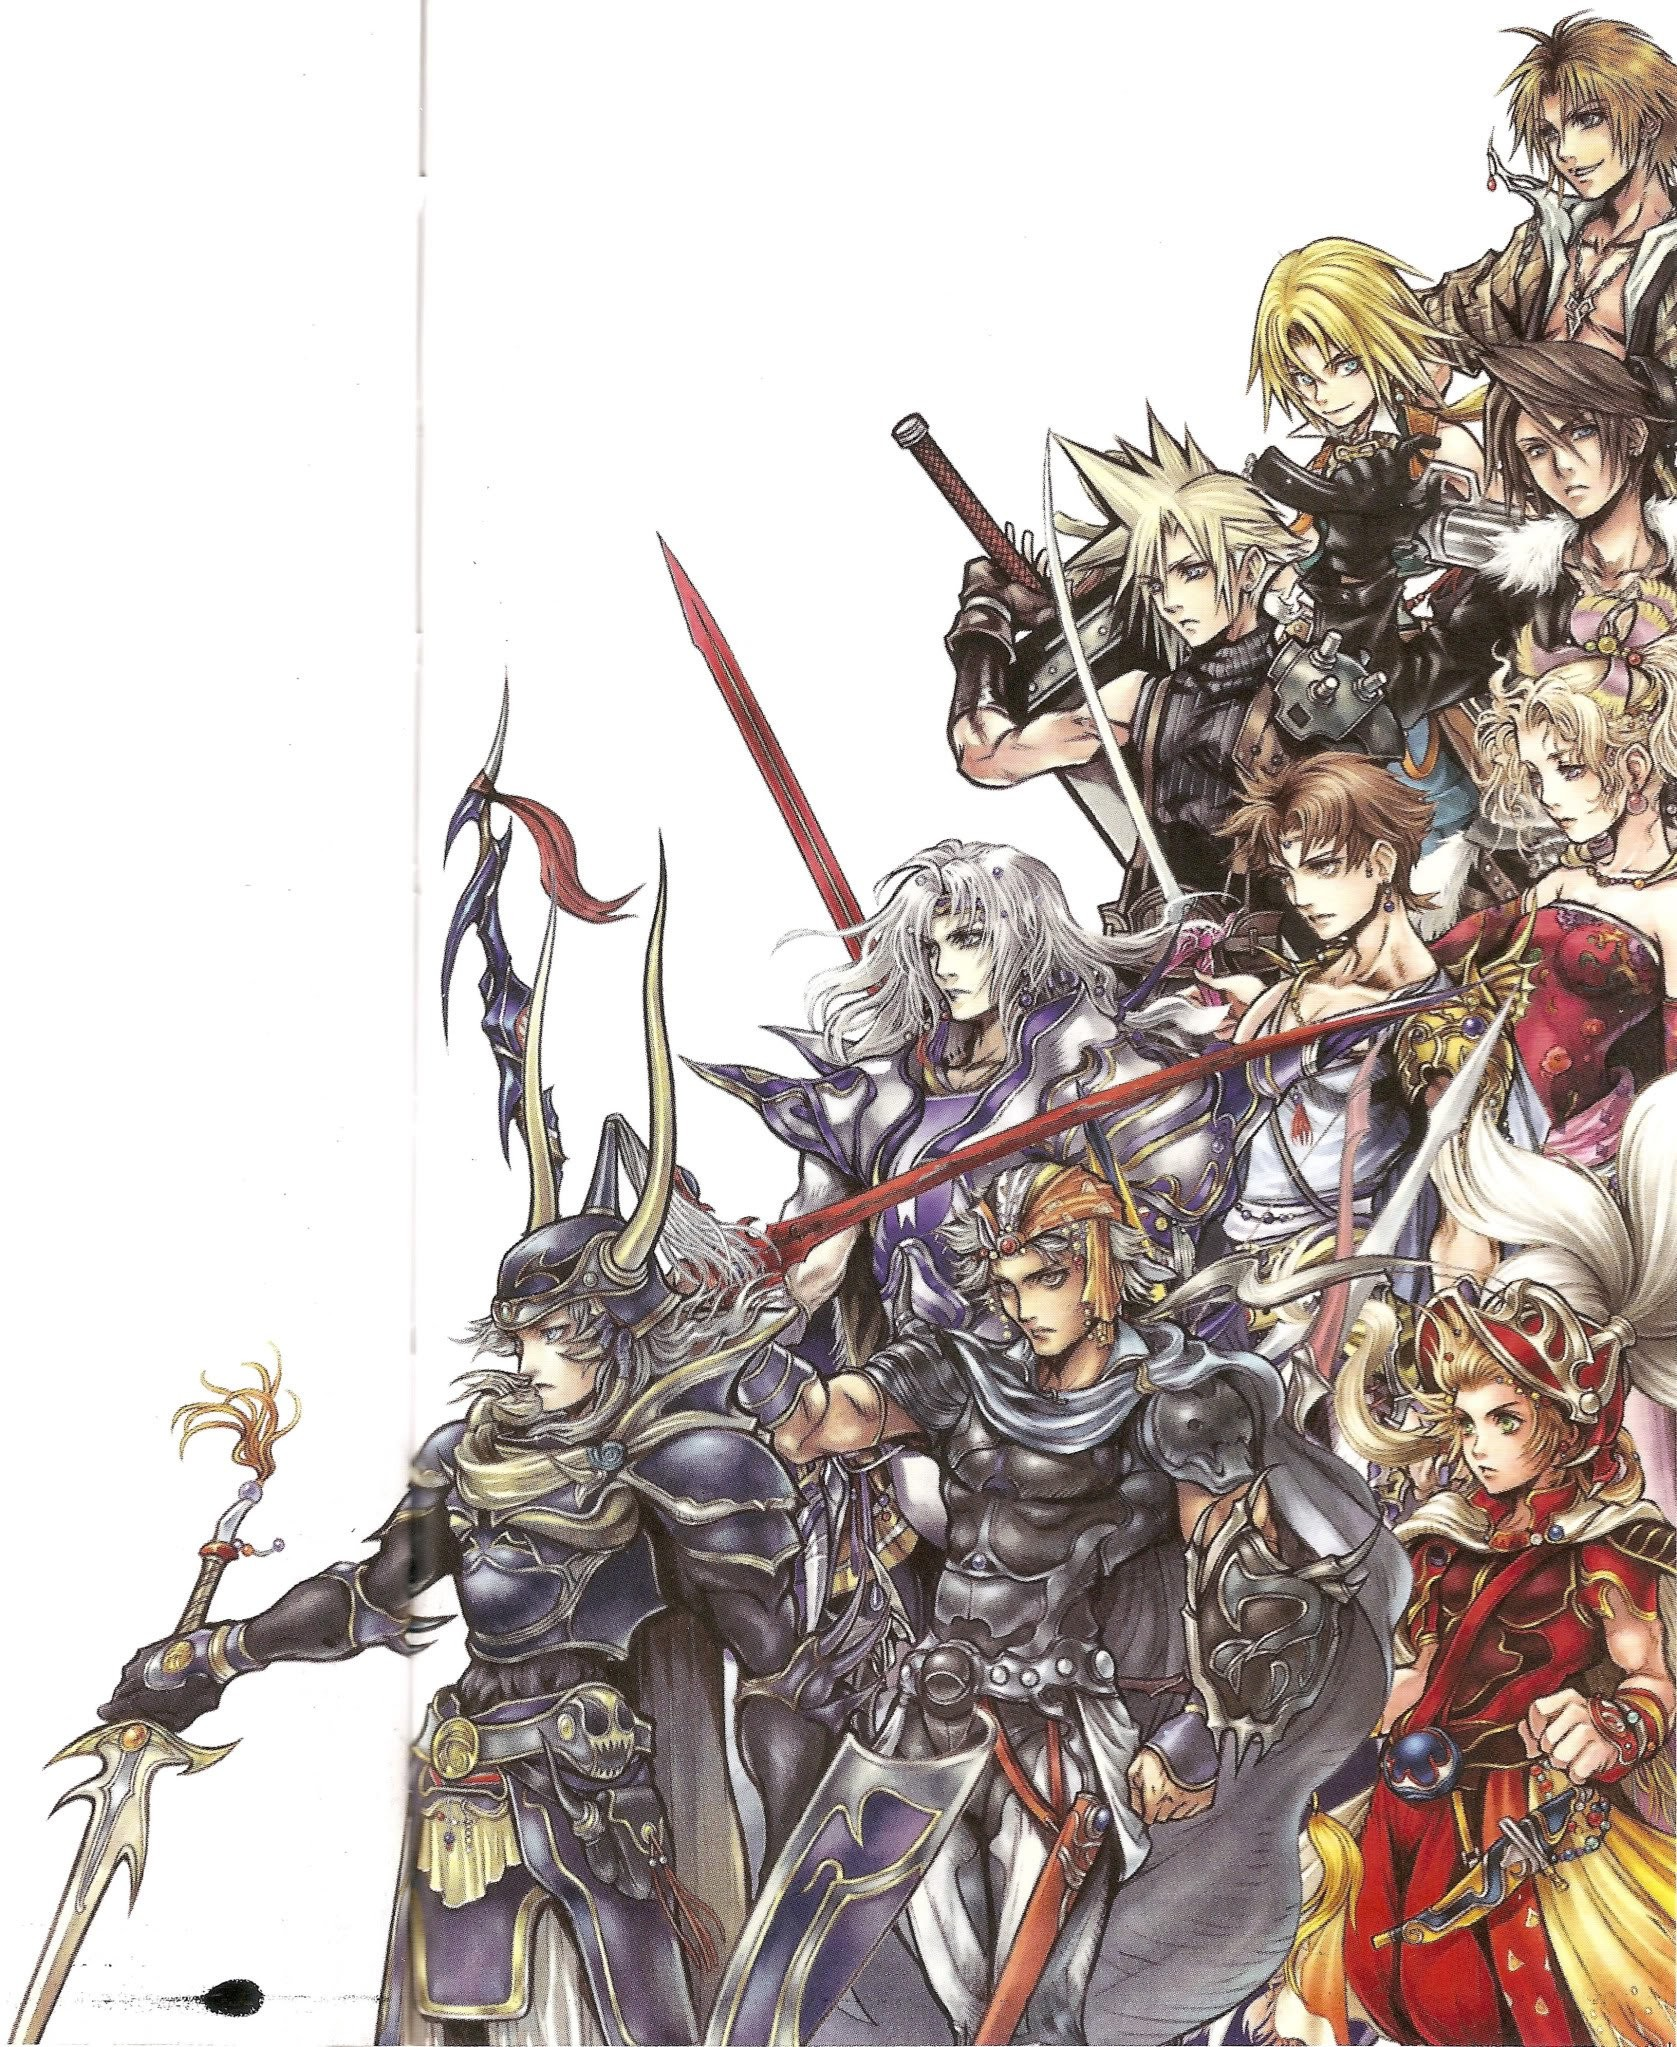 Final Fantasy Dissidia Wallpaper (62+ Images